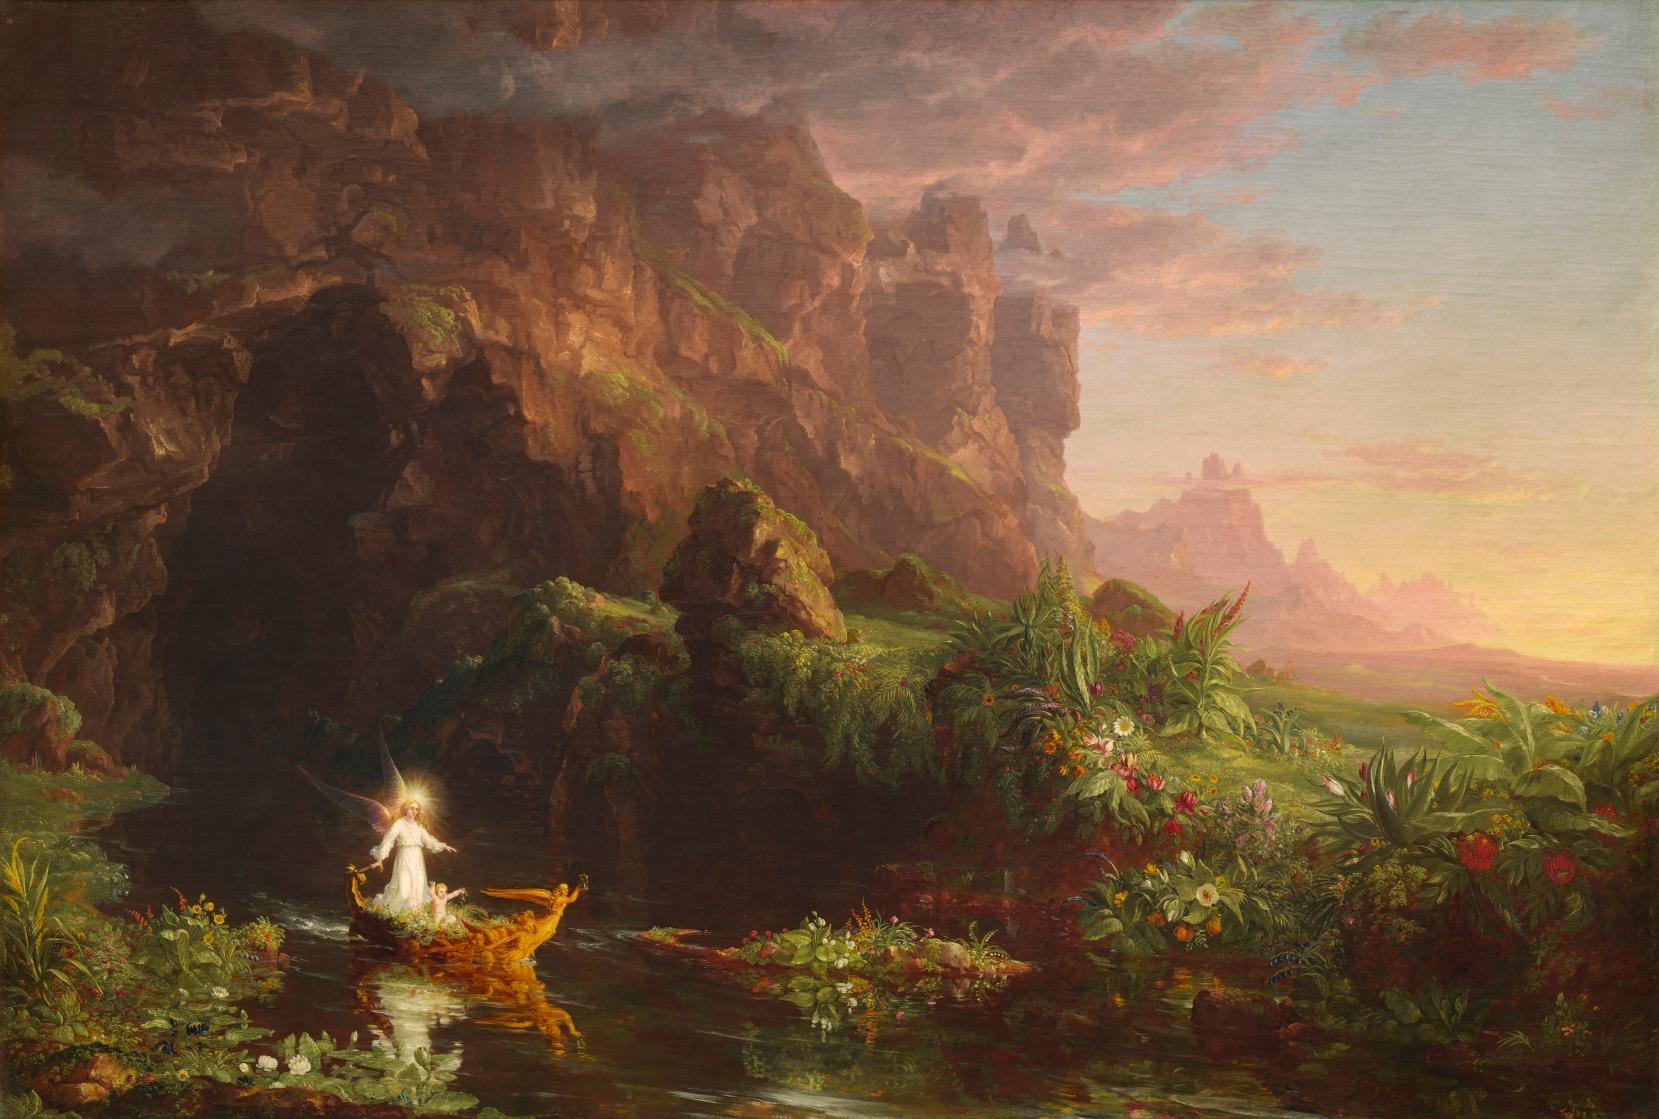 Thomas Cole, The Voyage of Life - Childhood